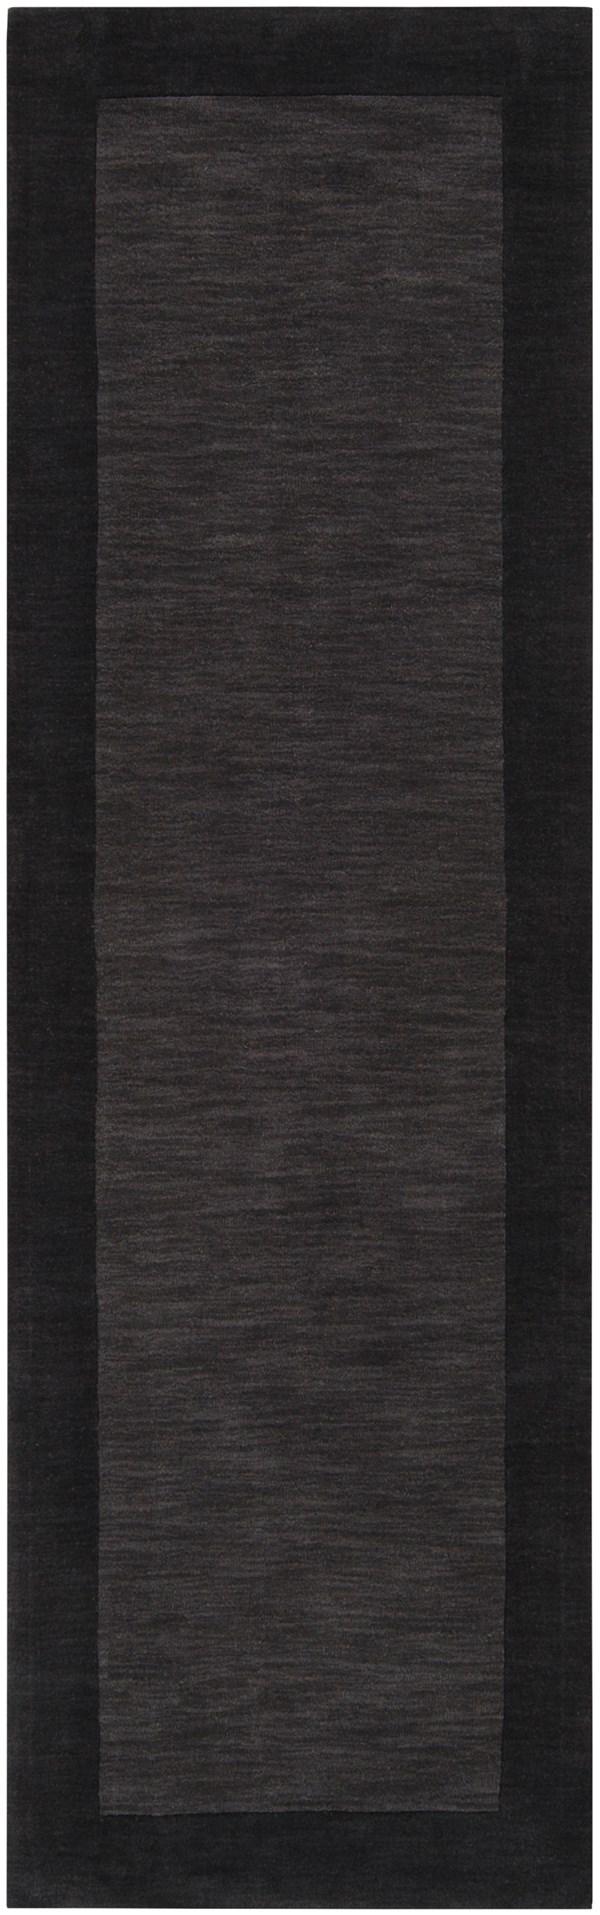 Charcoal, Black (M-347) Bordered Area Rug